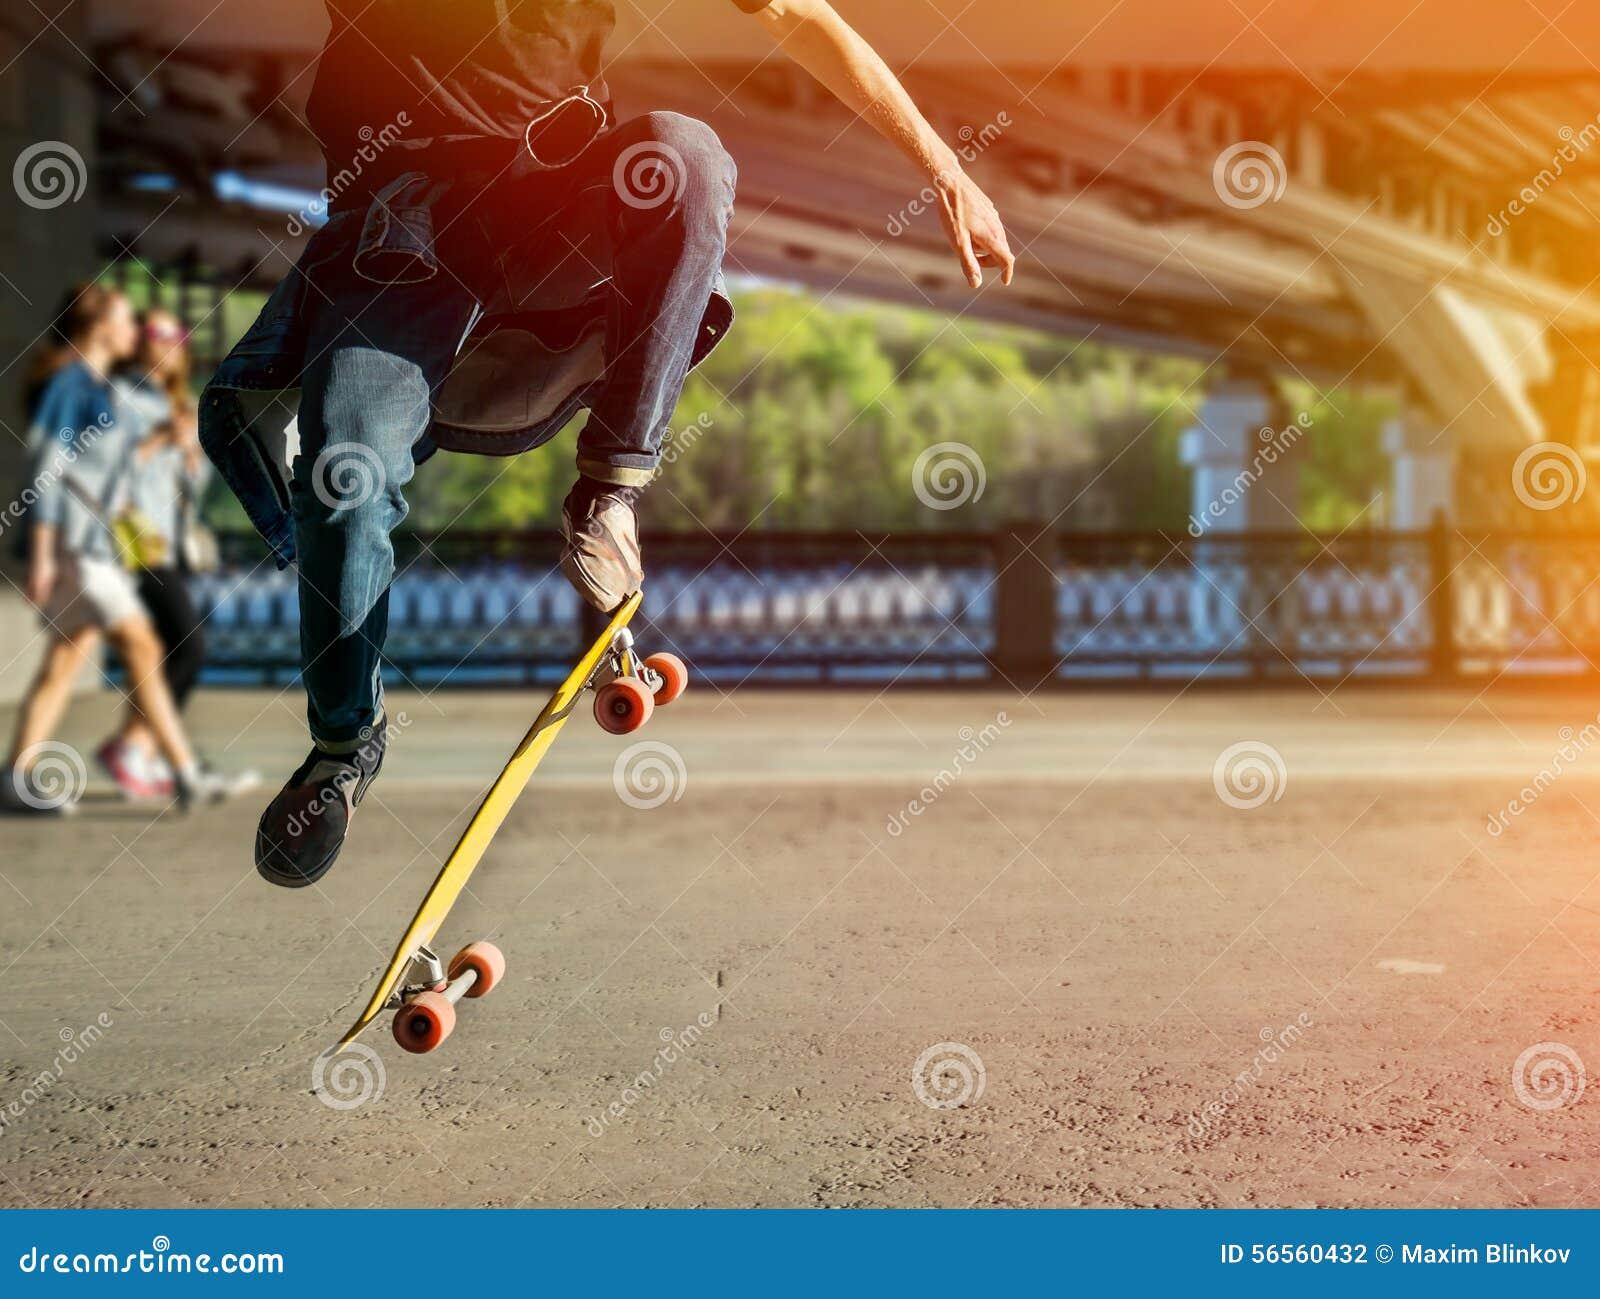 Download Σκιαγραφία Skateboarder που πηδά στην πόλη Στοκ Εικόνες - εικόνα από γρήγορα, ακτινίου: 56560432